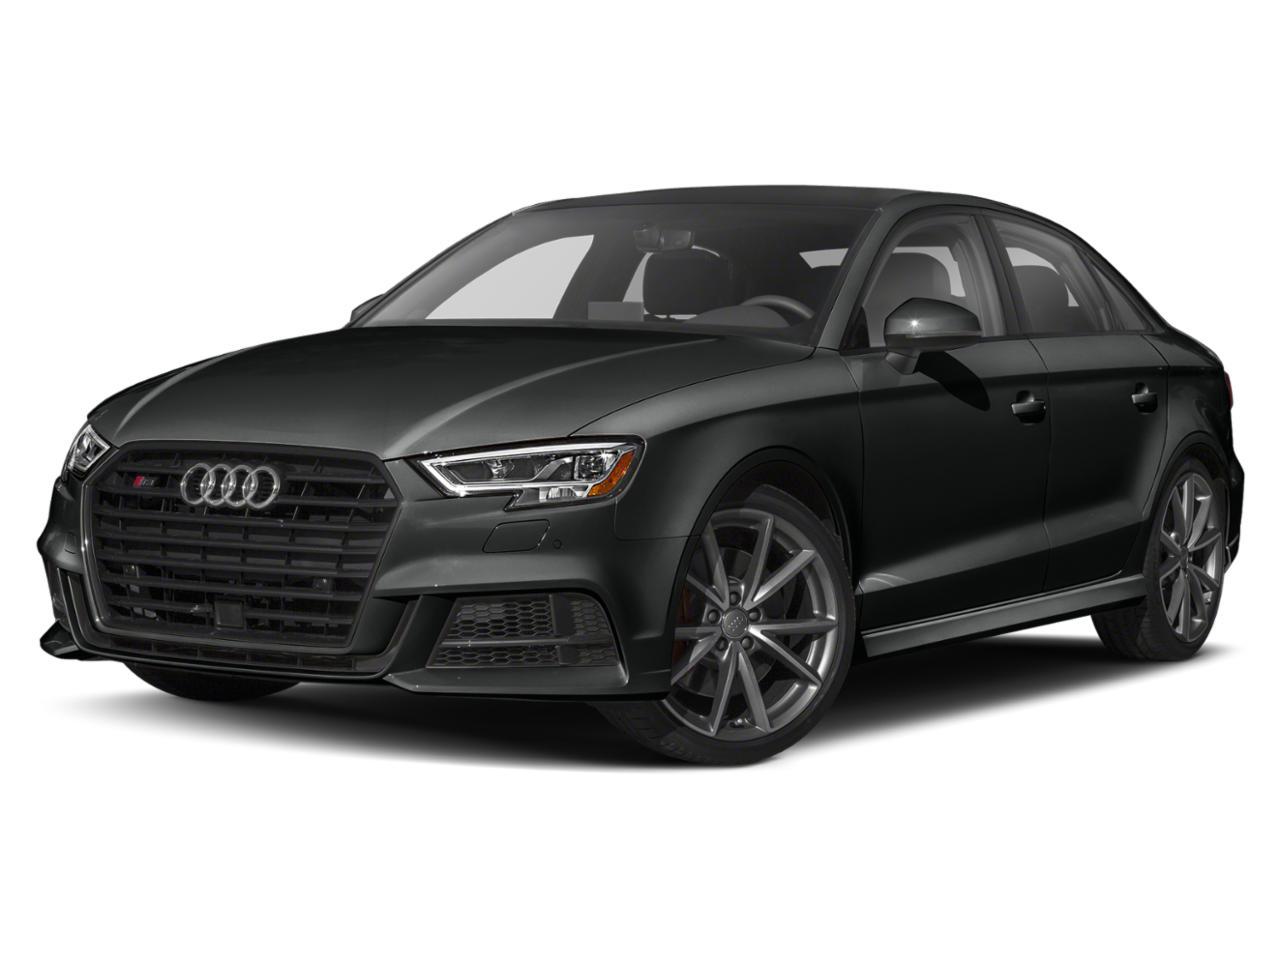 2019 Audi S3 Vehicle Photo in Colorado Springs, CO 80905